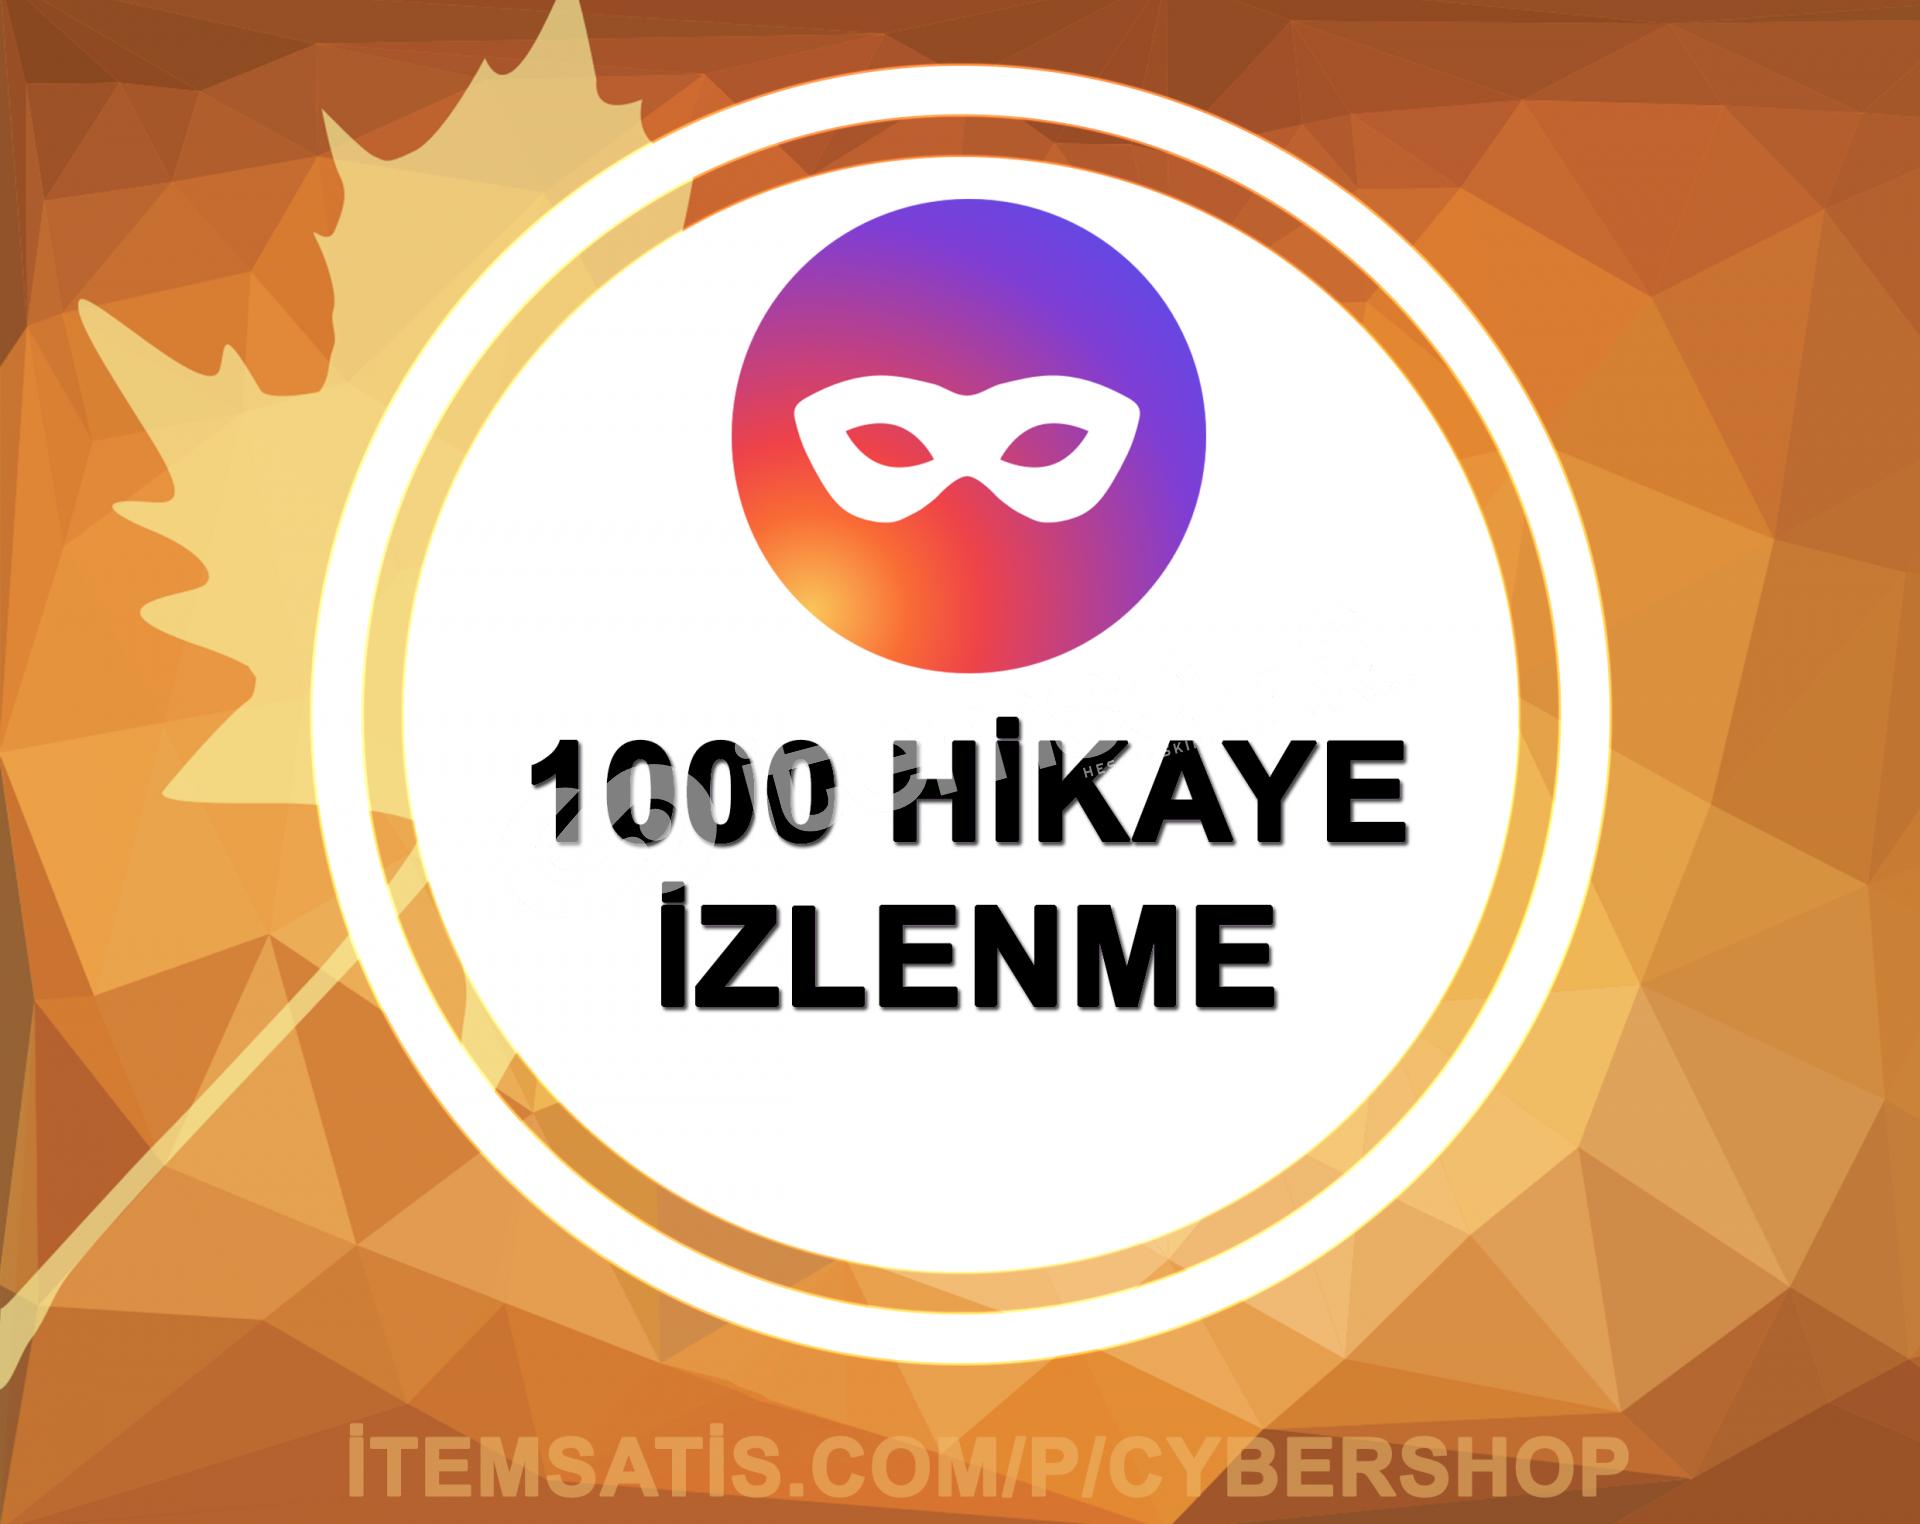 1000 Hikaye İzlenme (Tüm Hikayeler)